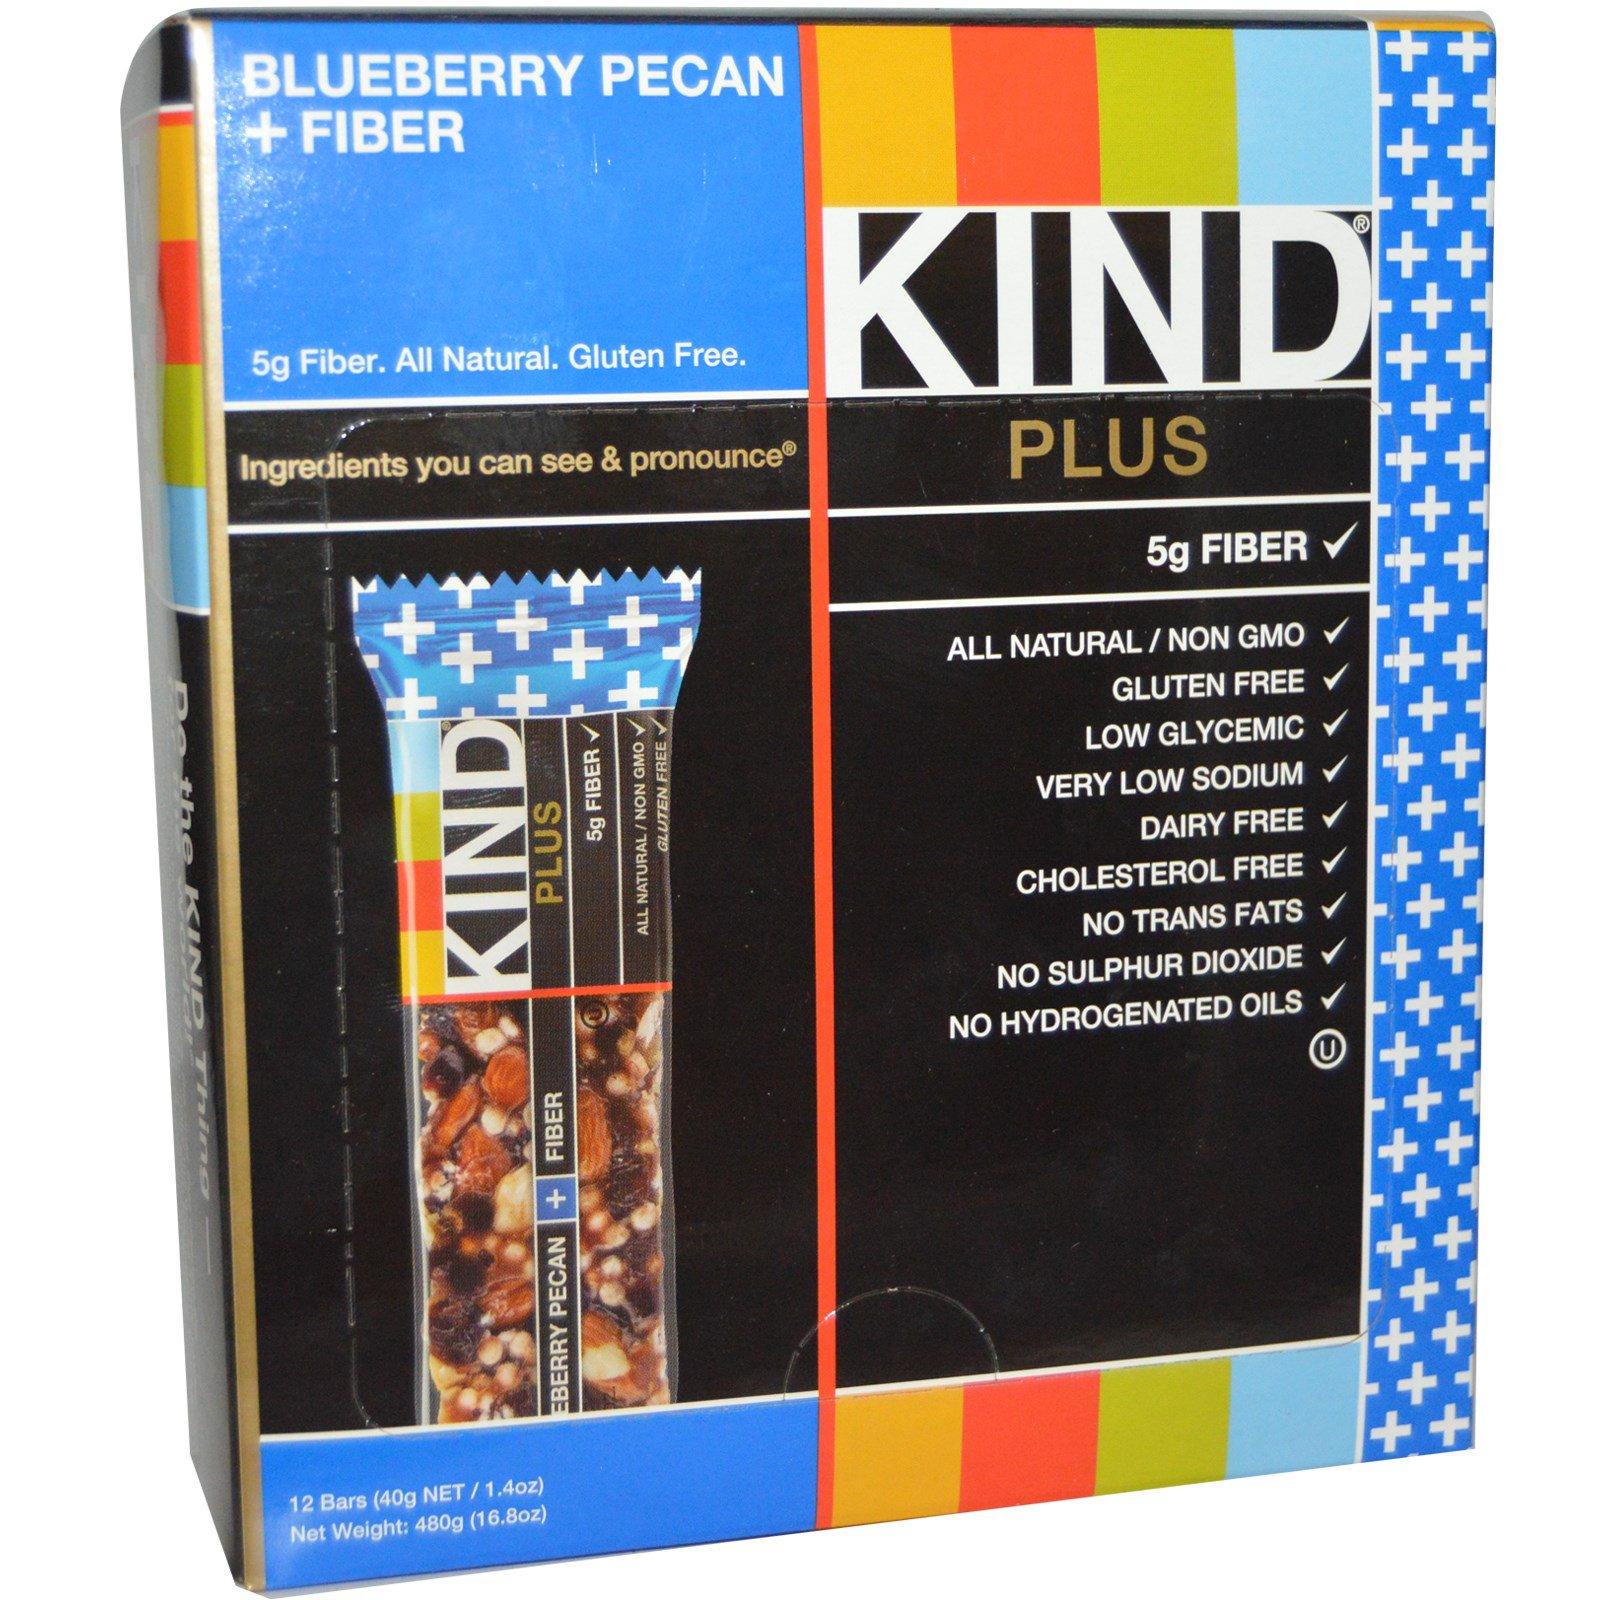 KIND Bars, Plus, Blueberry Pecan + Fiber, 12 Bars, 1.4 oz Each